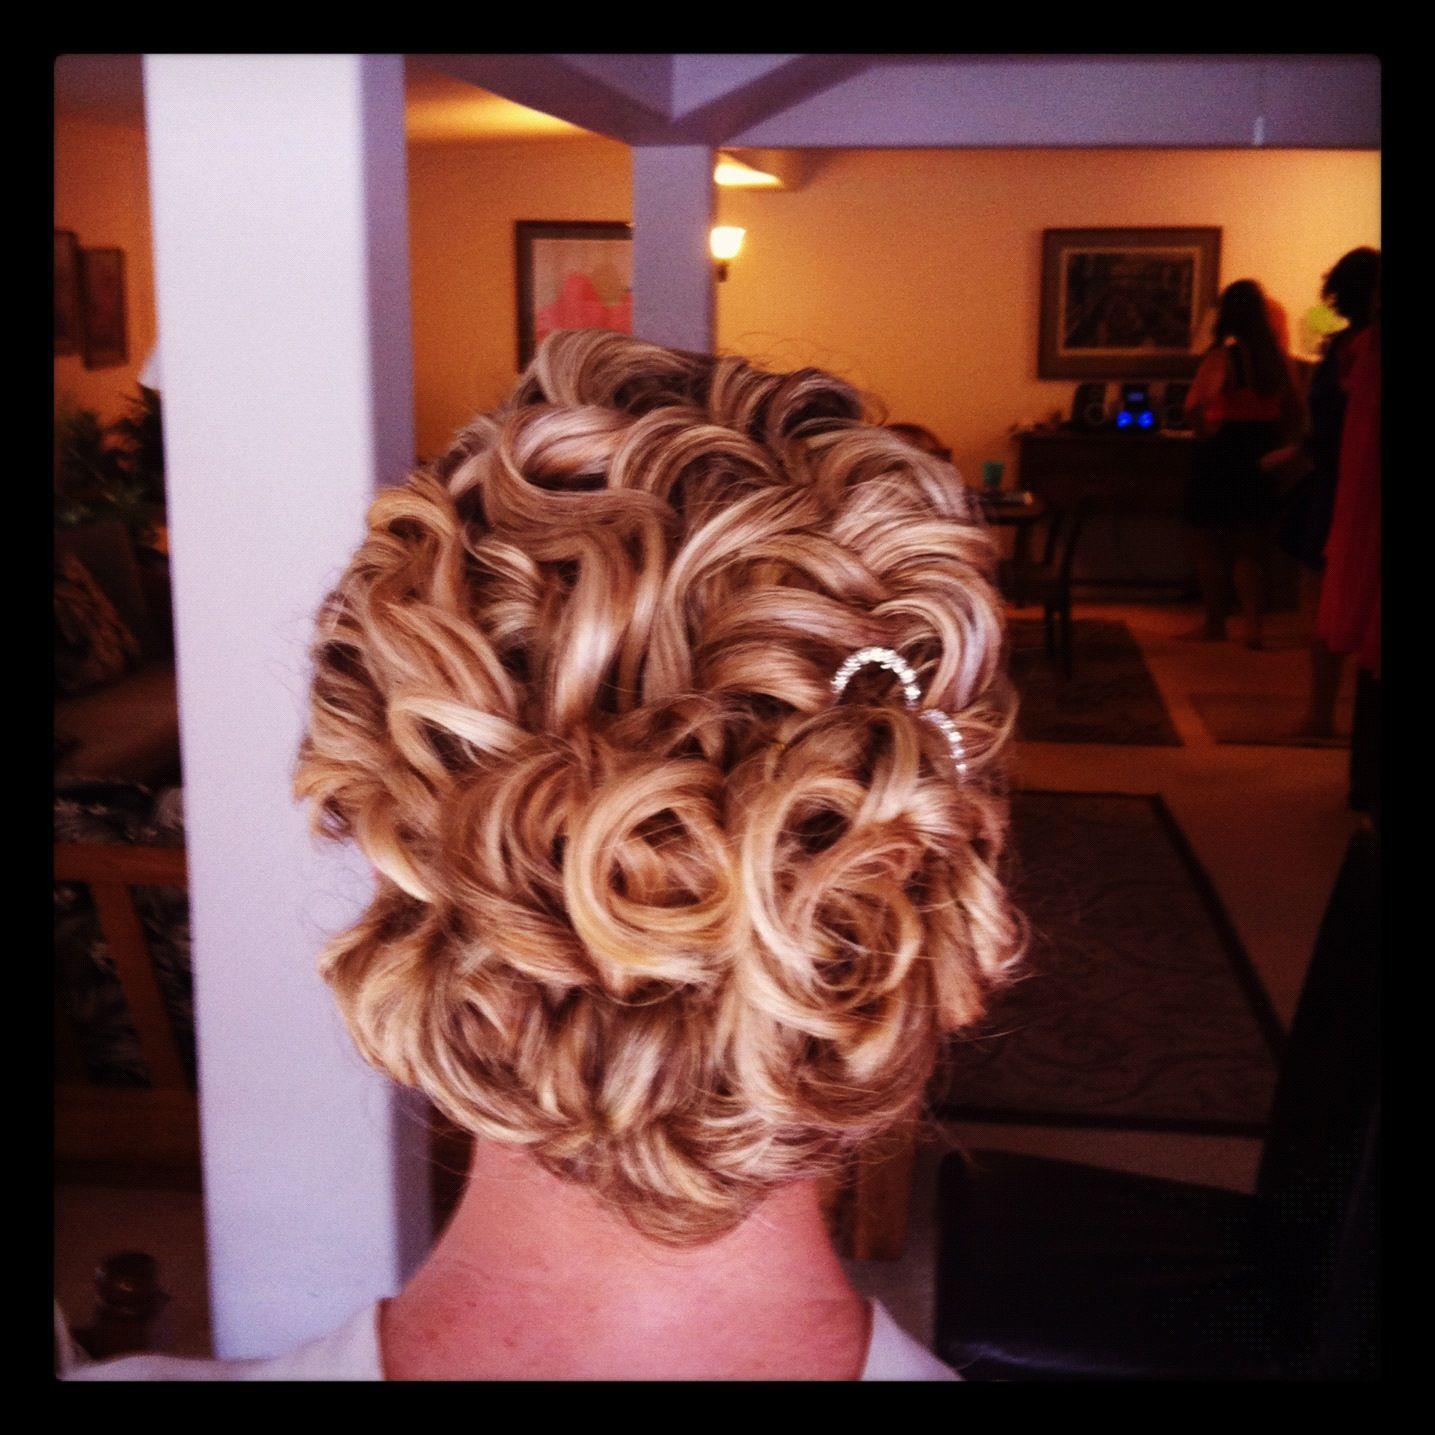 Curly hair updo hair mia moriguchi my portfolio pinterest